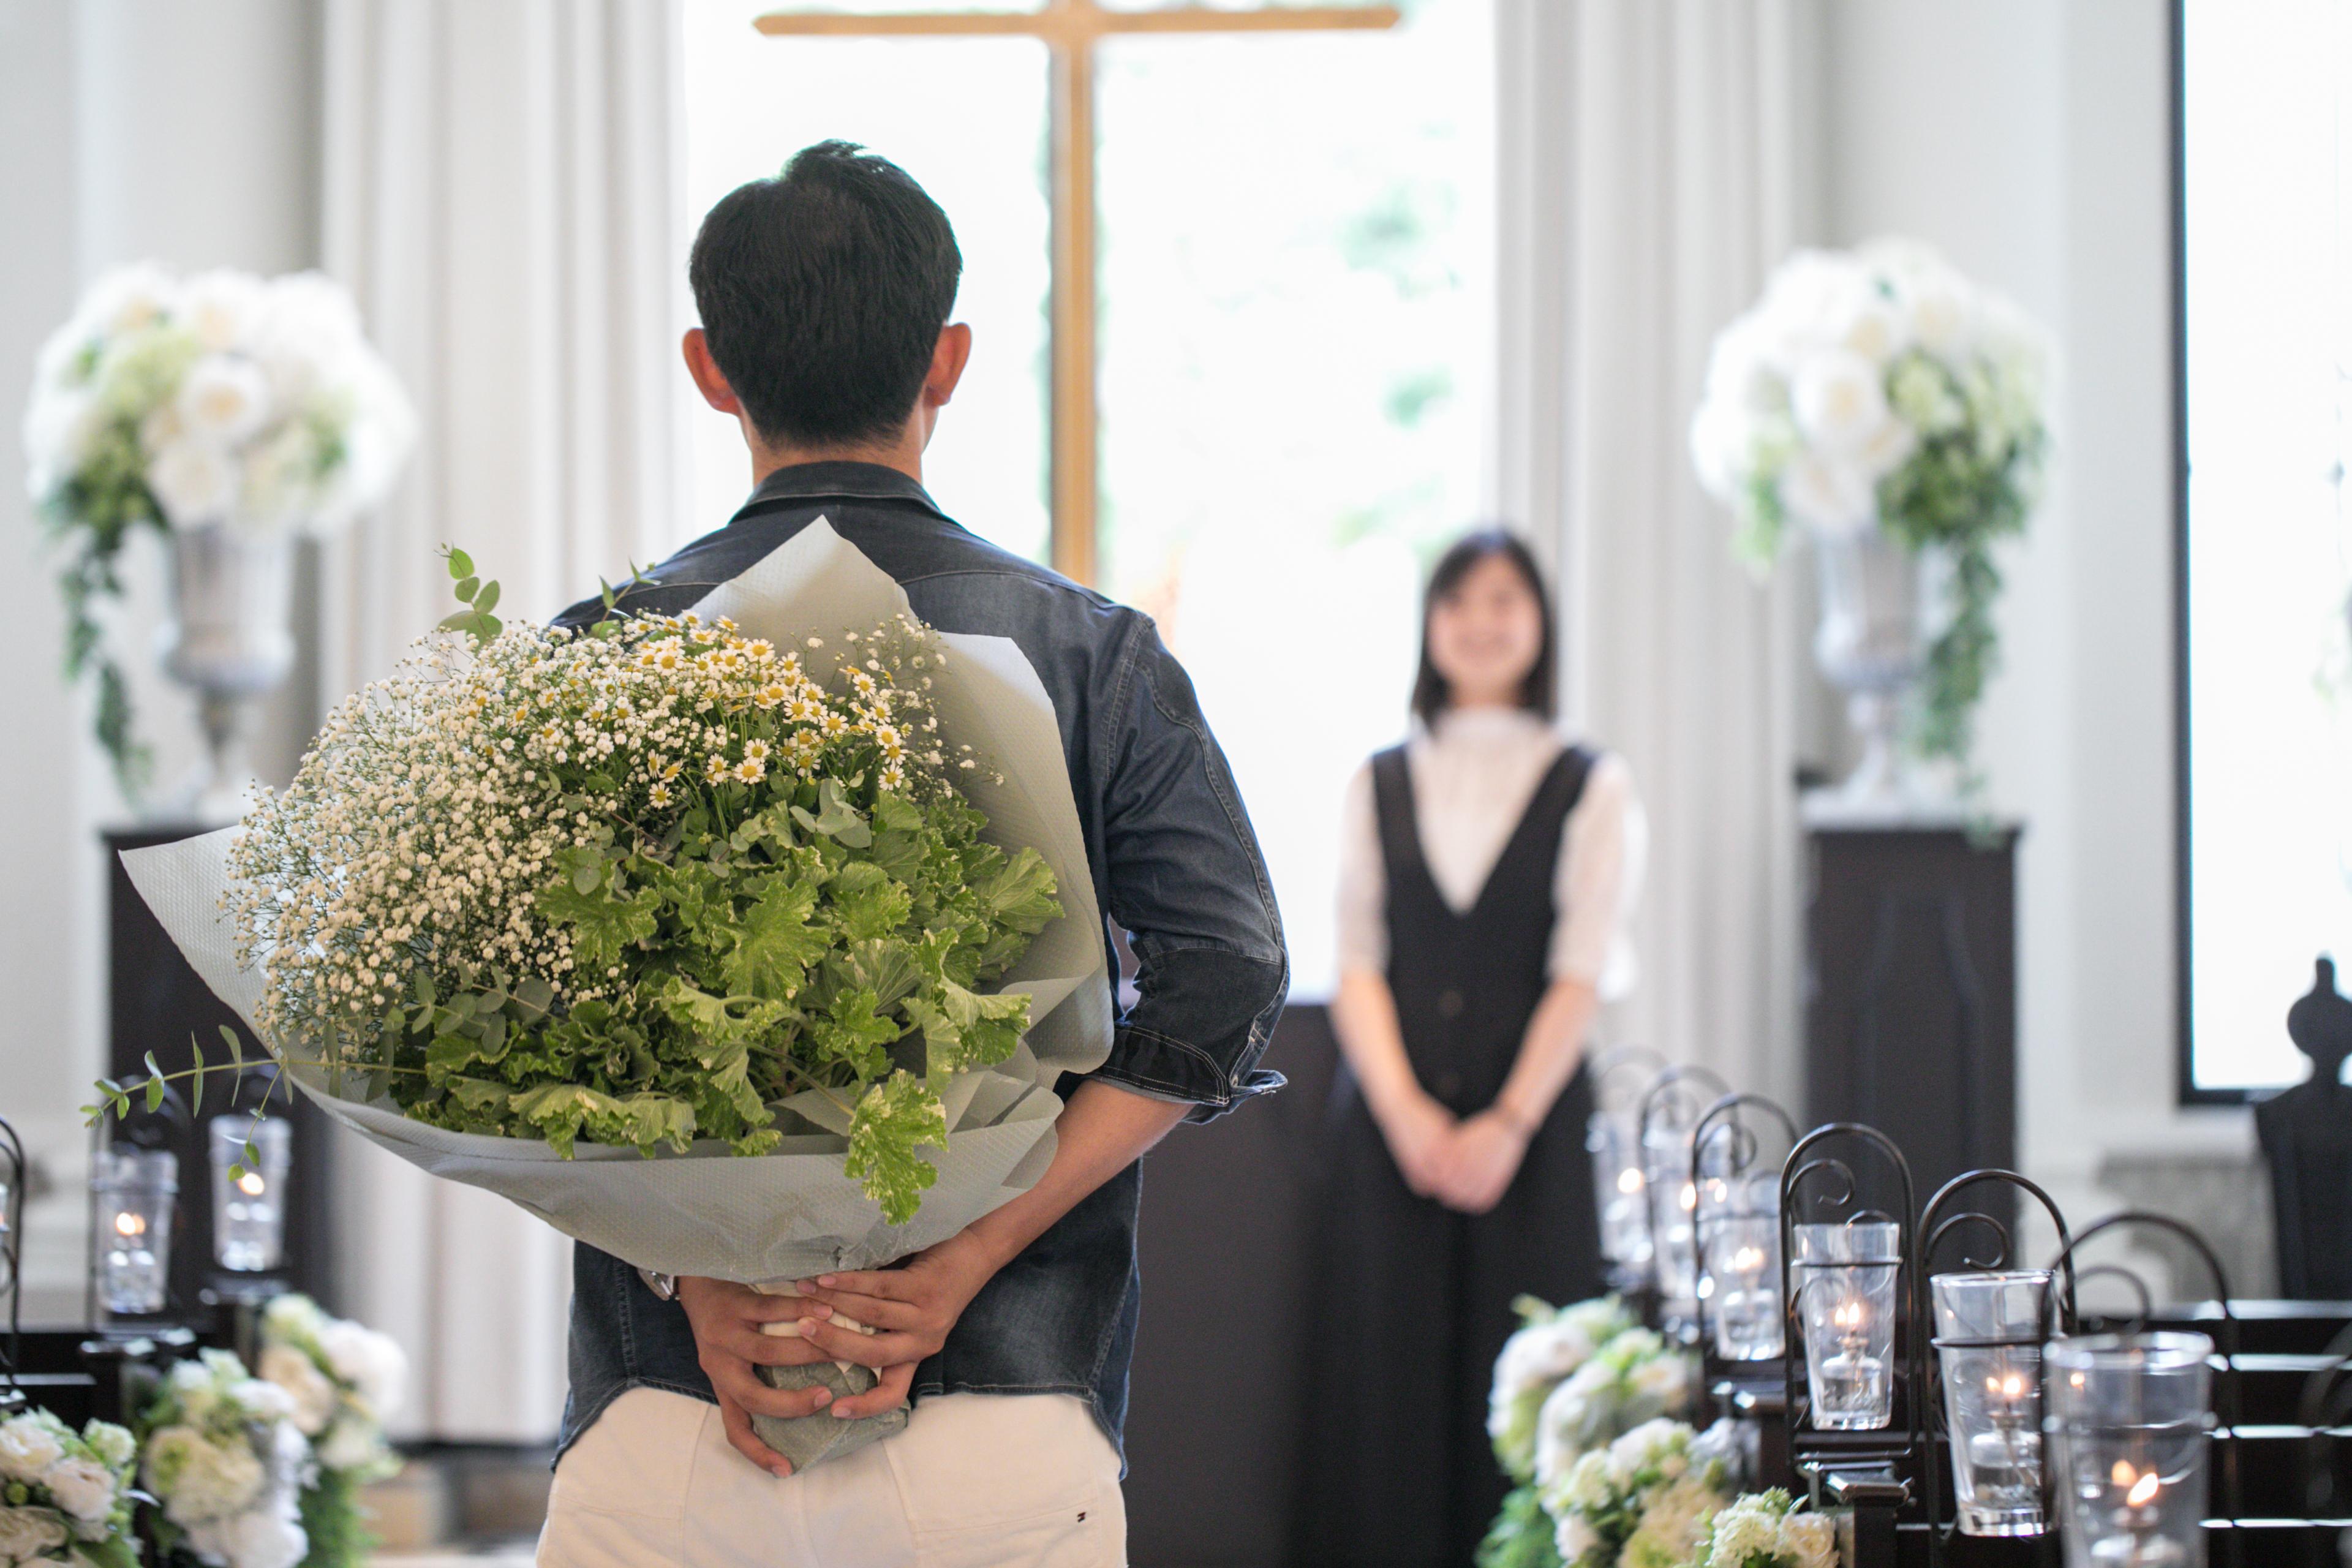 【Webテレビ】12月27日(木)放送『Abema Morning』(日本テレビ)でT&Gプロデュースのサプライズプロポーズの様子が放送されました。